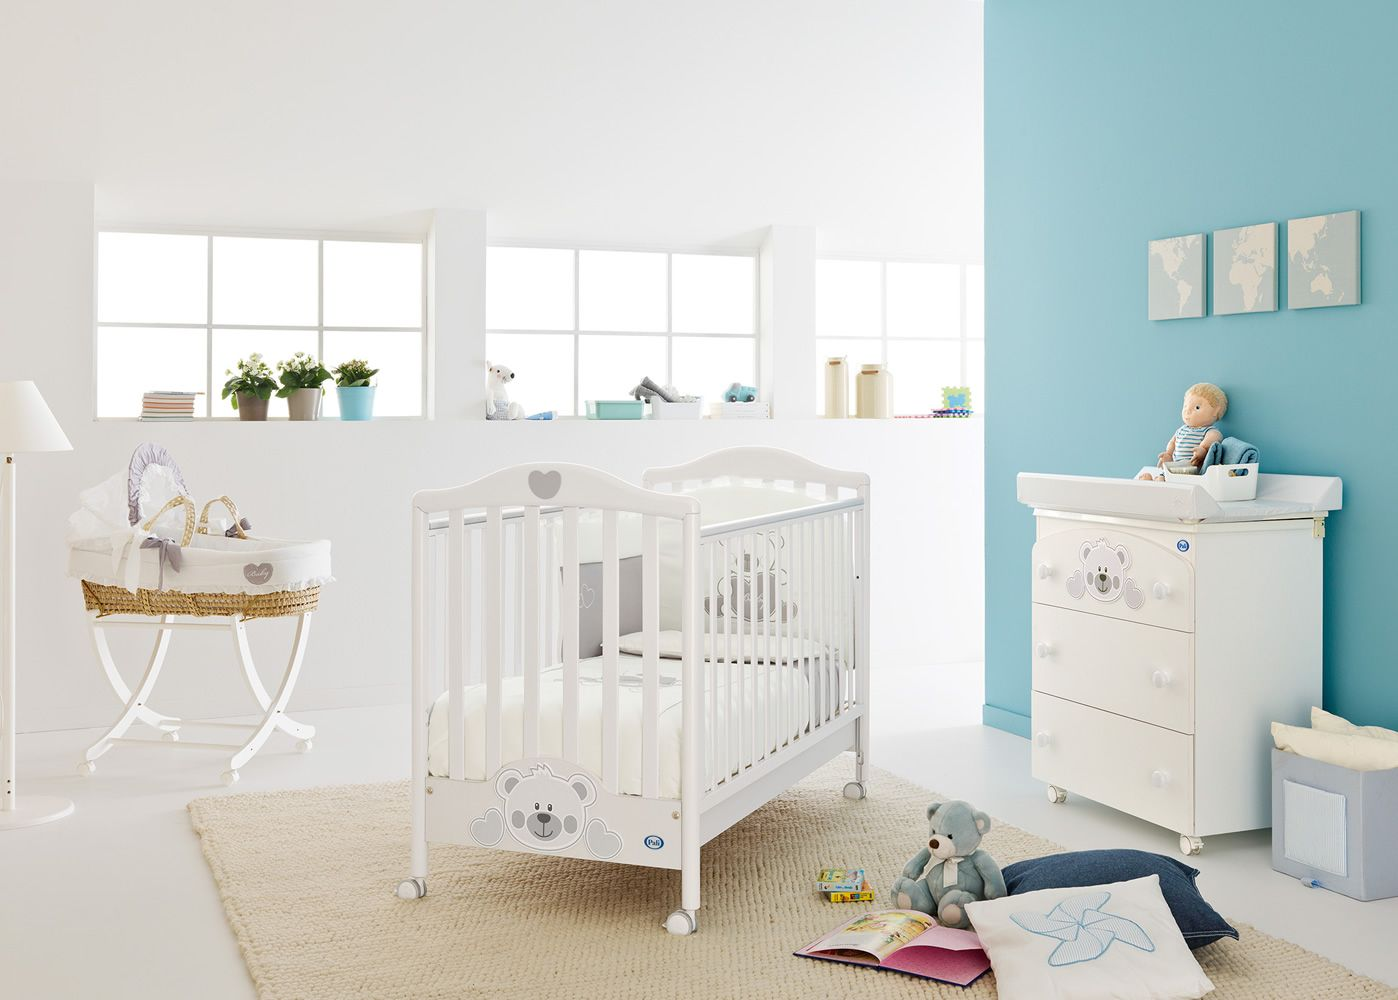 baby baby mb couffin porte enfant avec capote et support. Black Bedroom Furniture Sets. Home Design Ideas